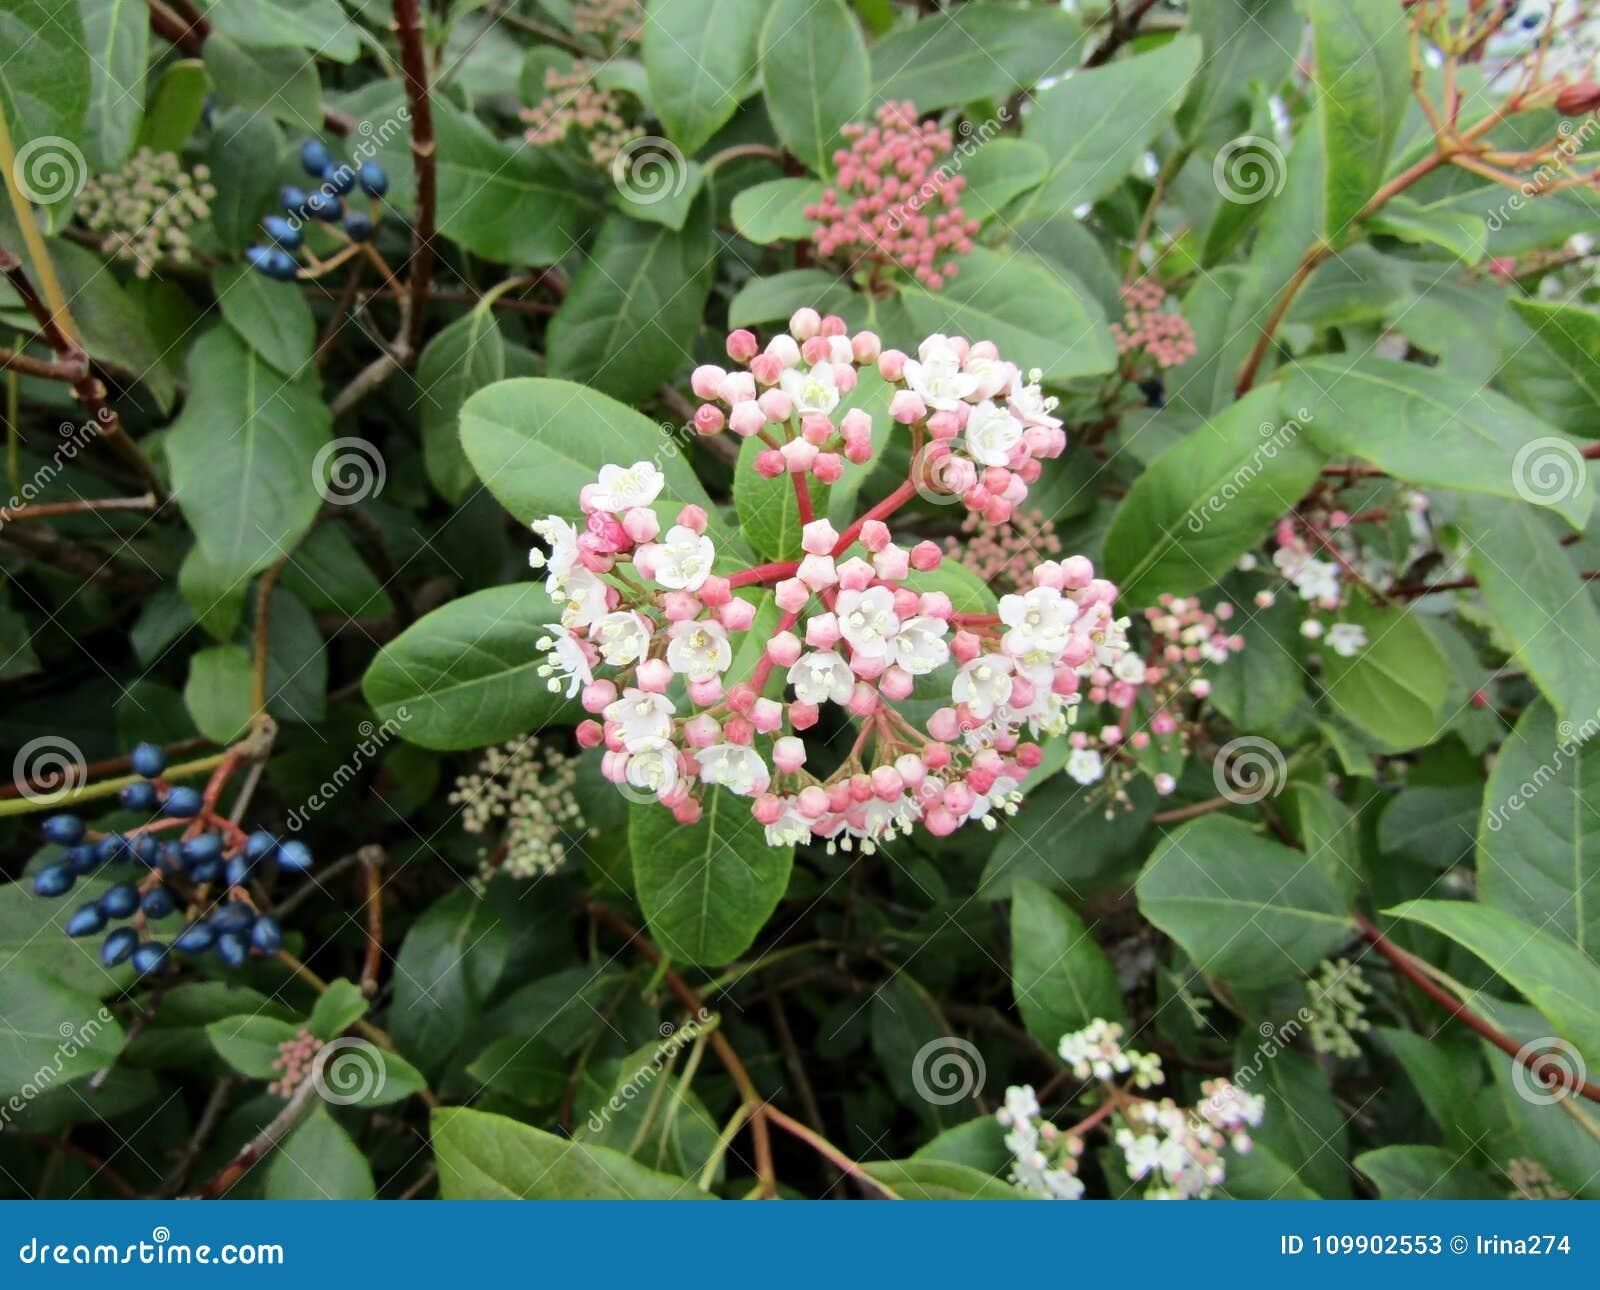 Download Flowers And Berries Of Viburnum Tinus / Laurustinus Viburnum. Stock Image - Image of flowers, flower: 109902553